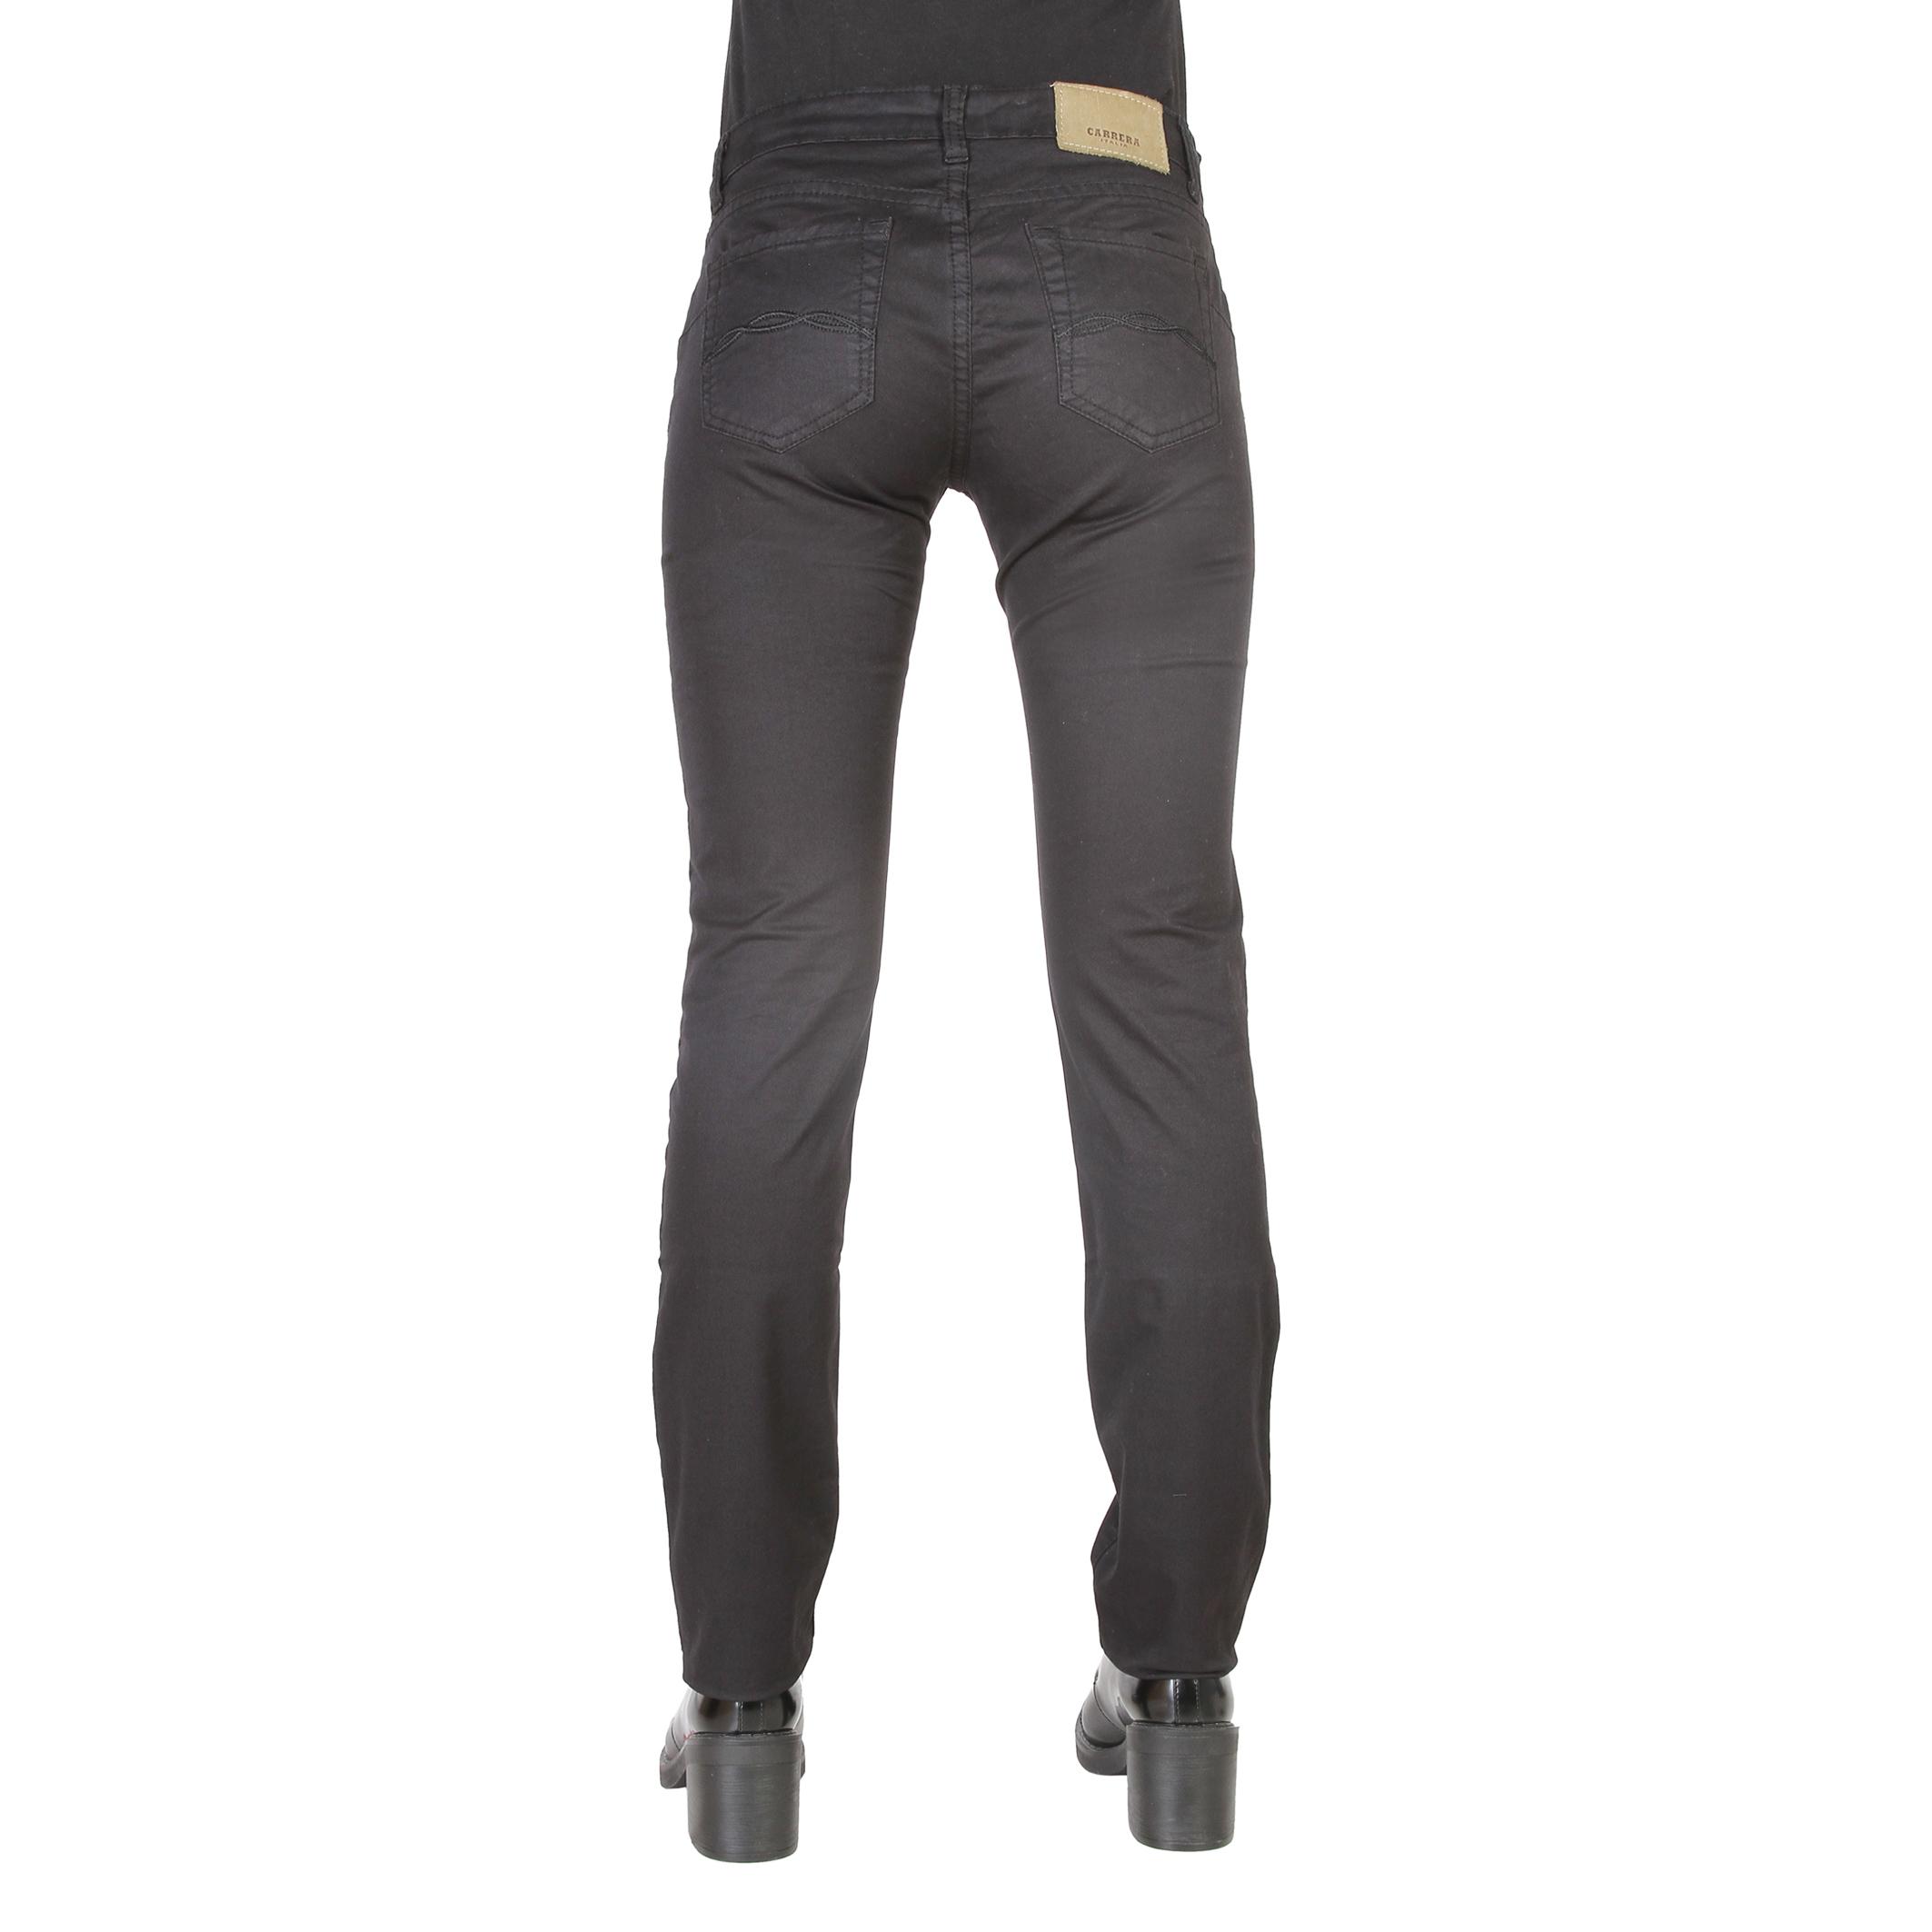 Pantalons  Carrera Jeans 000760_1556A black